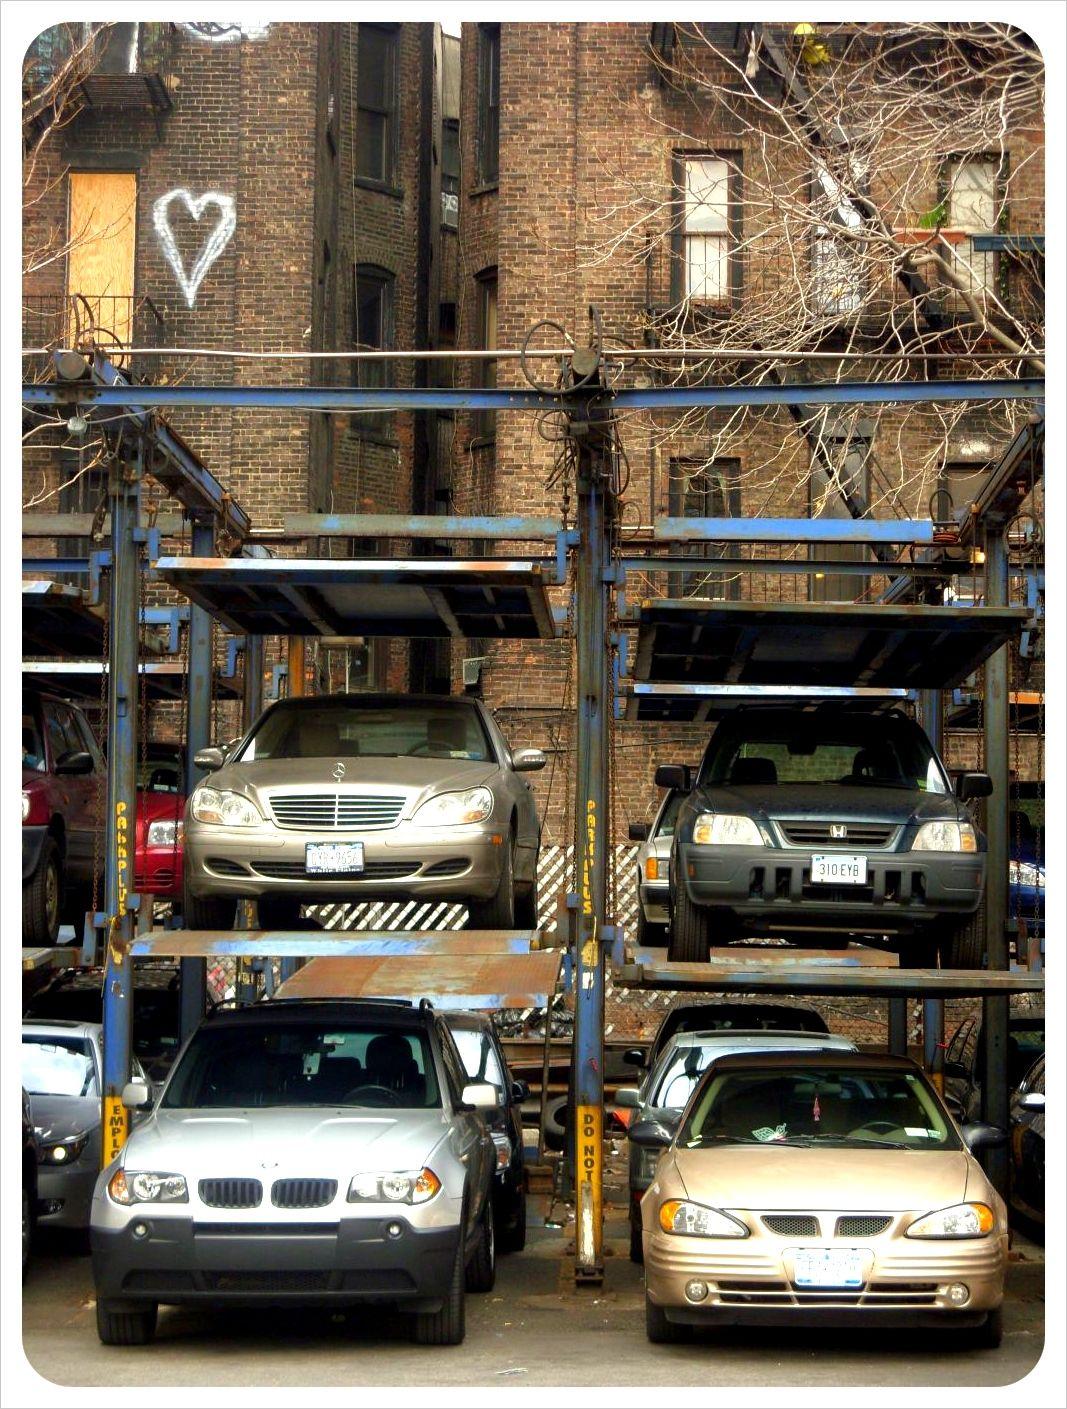 33 Things We Love About New York City Viajes Nueva York Parking